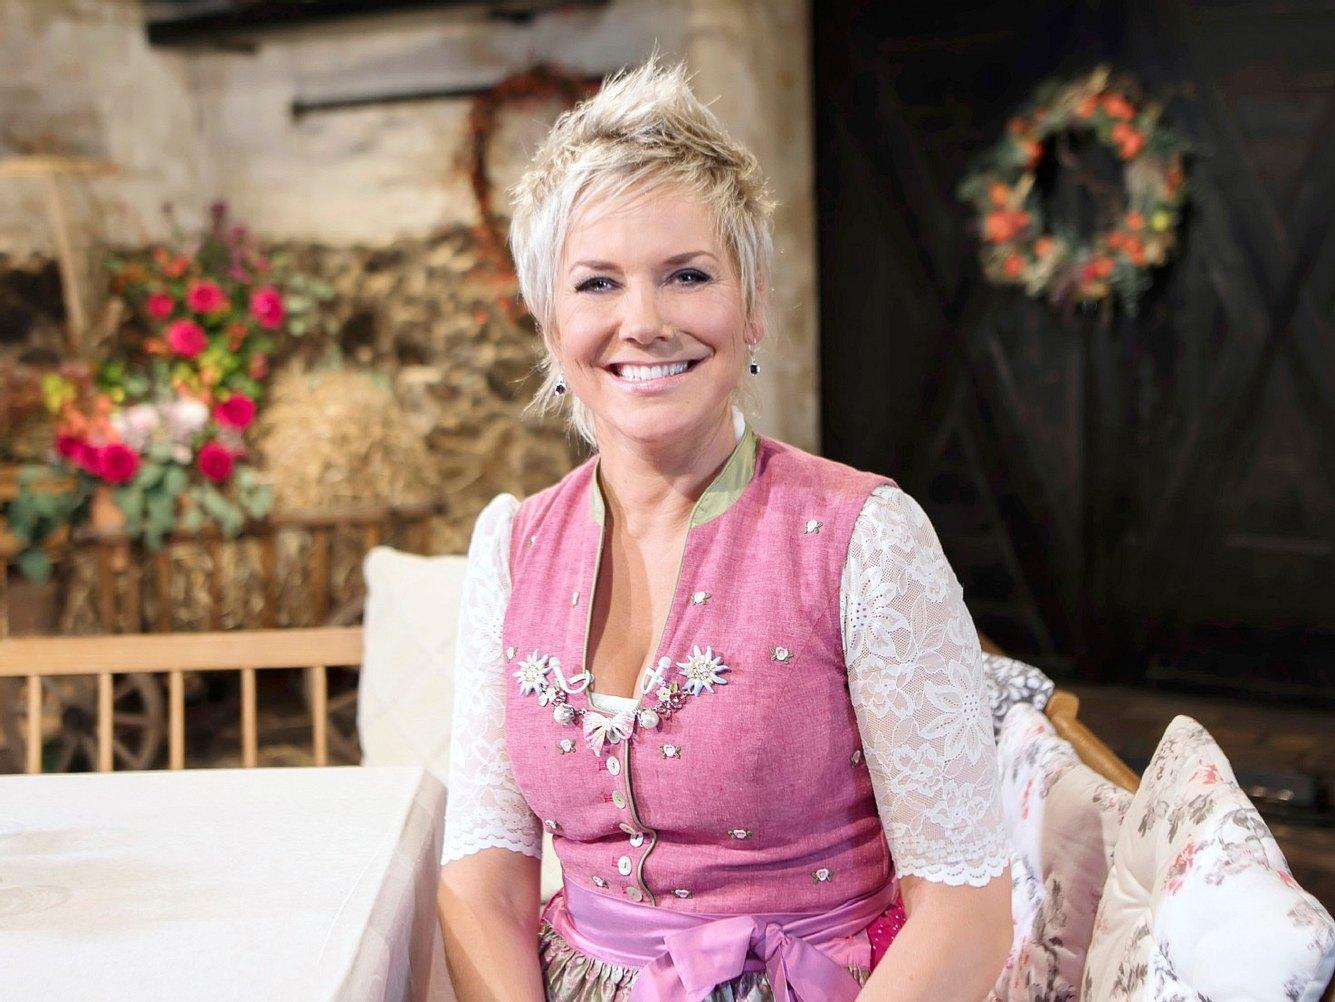 'Bauer sucht Frau'-Moderatorin Inka Bause.